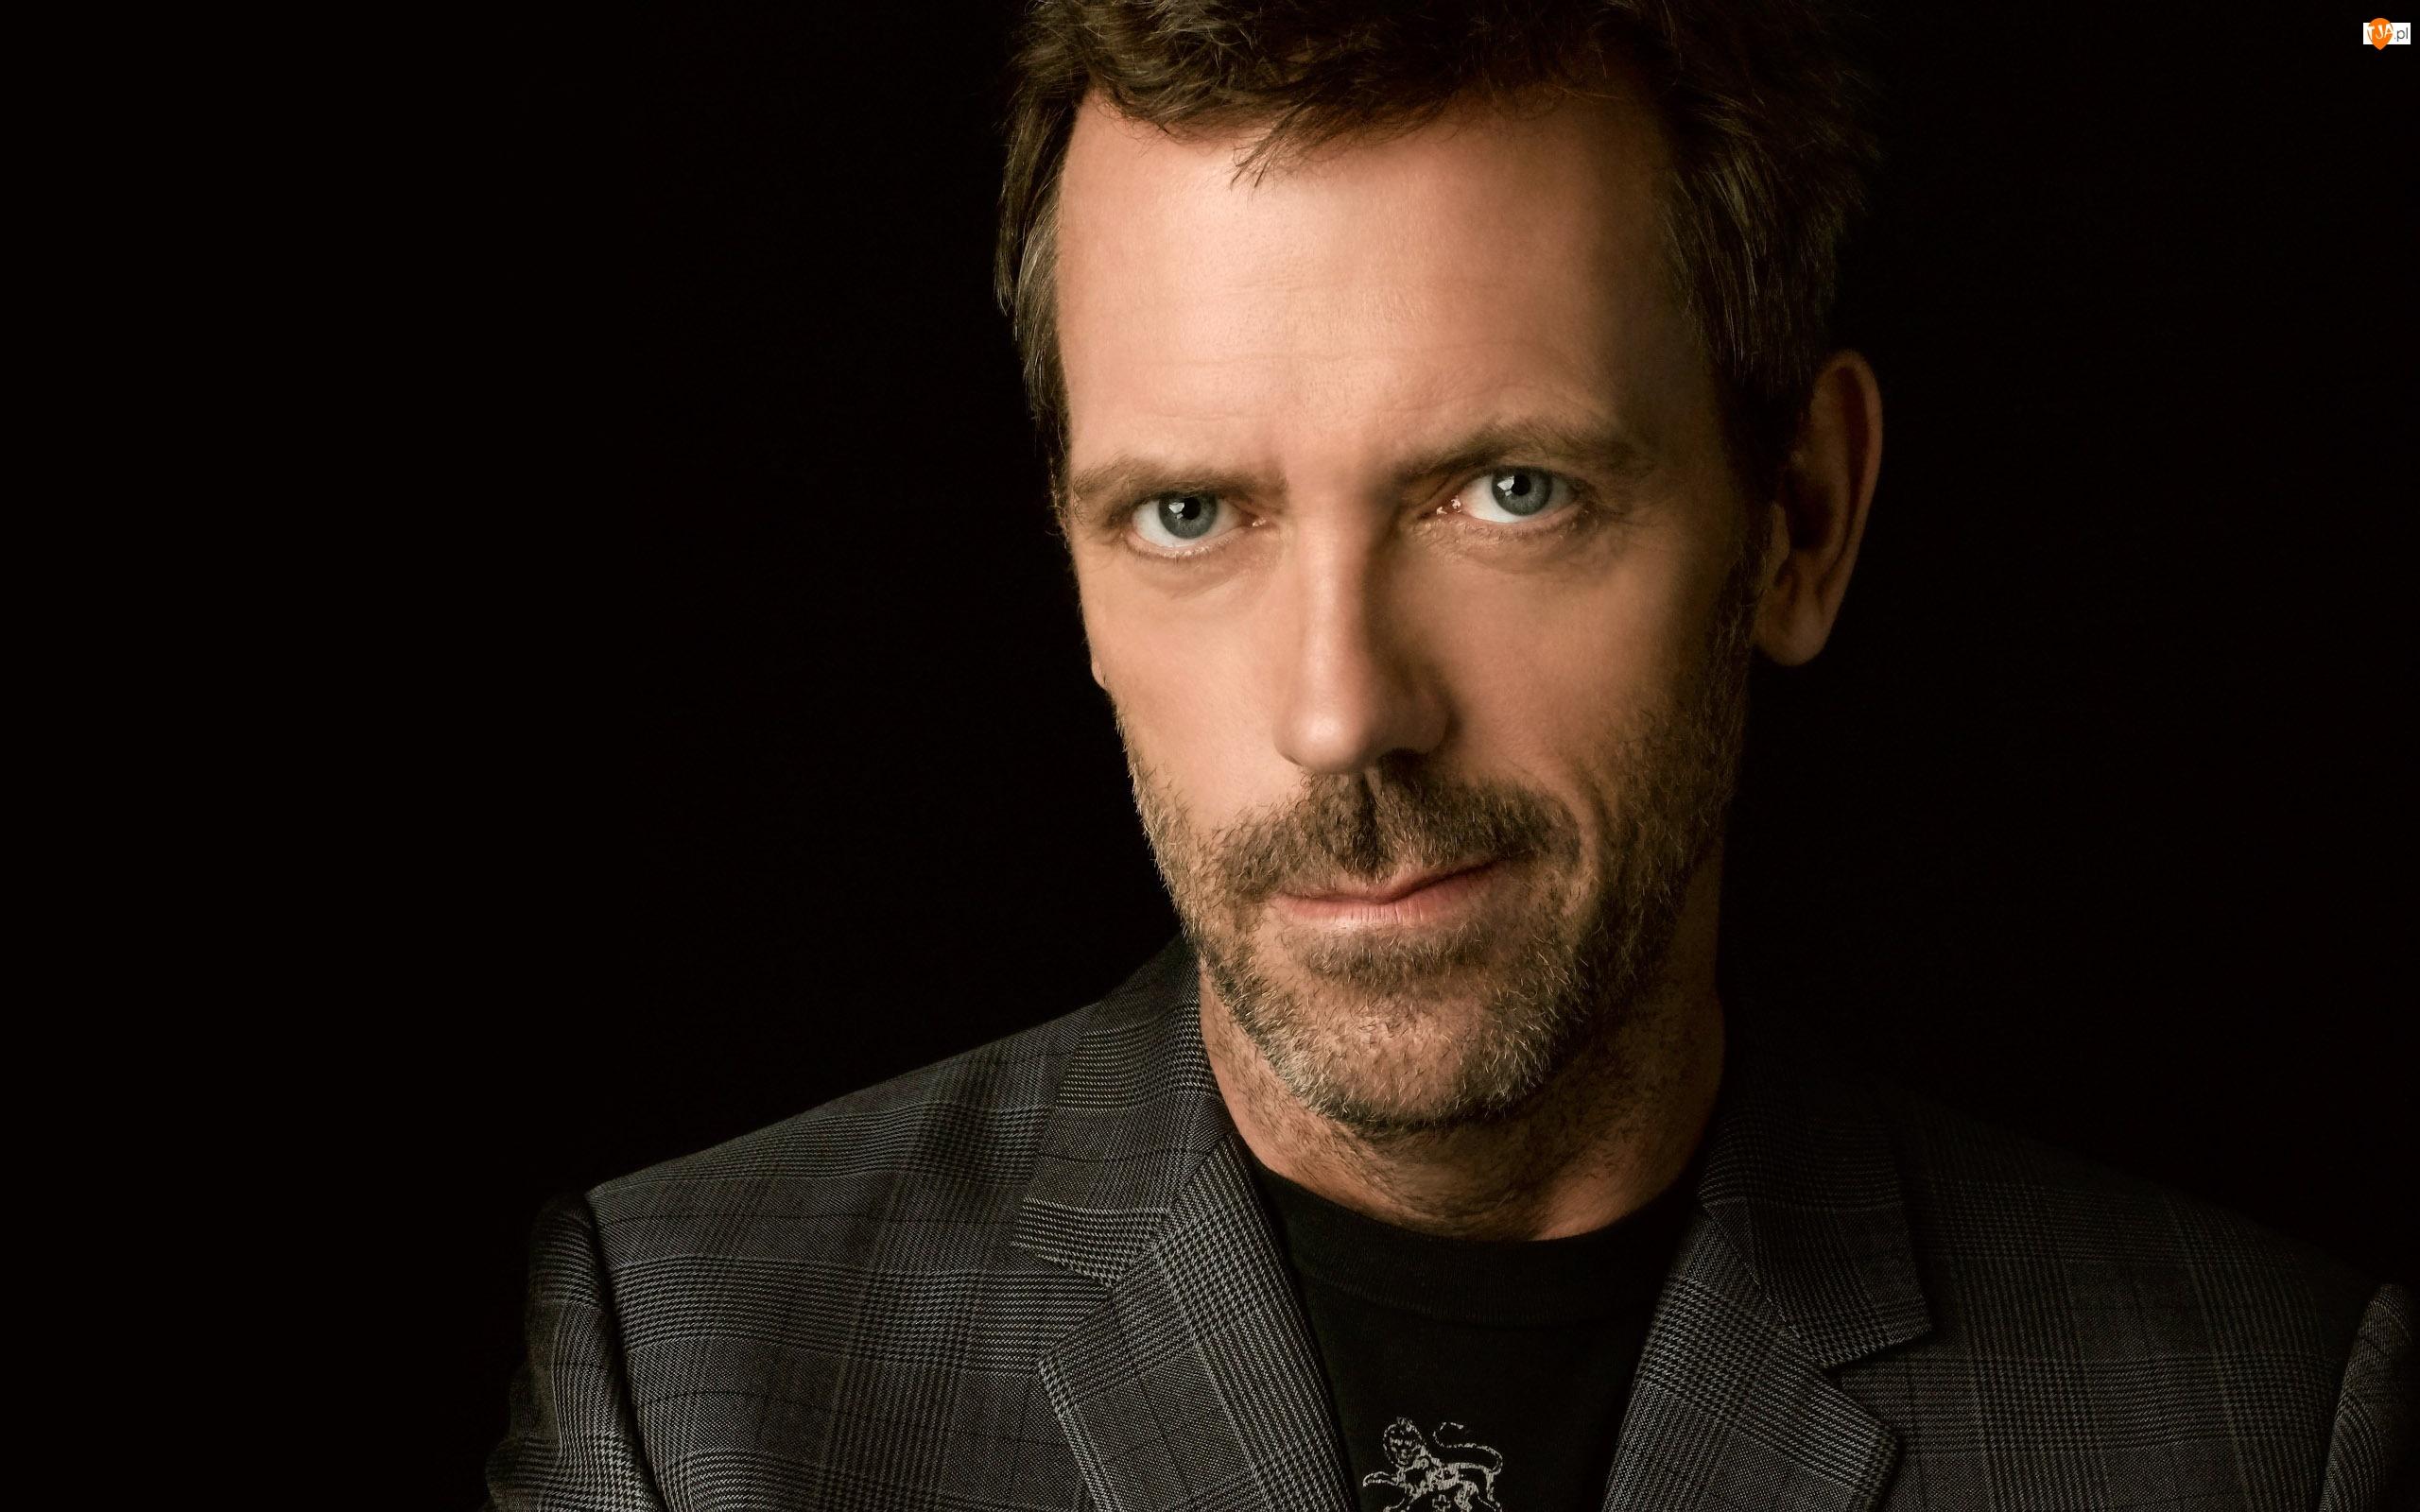 Portret, Aktor, Hugh Laurie